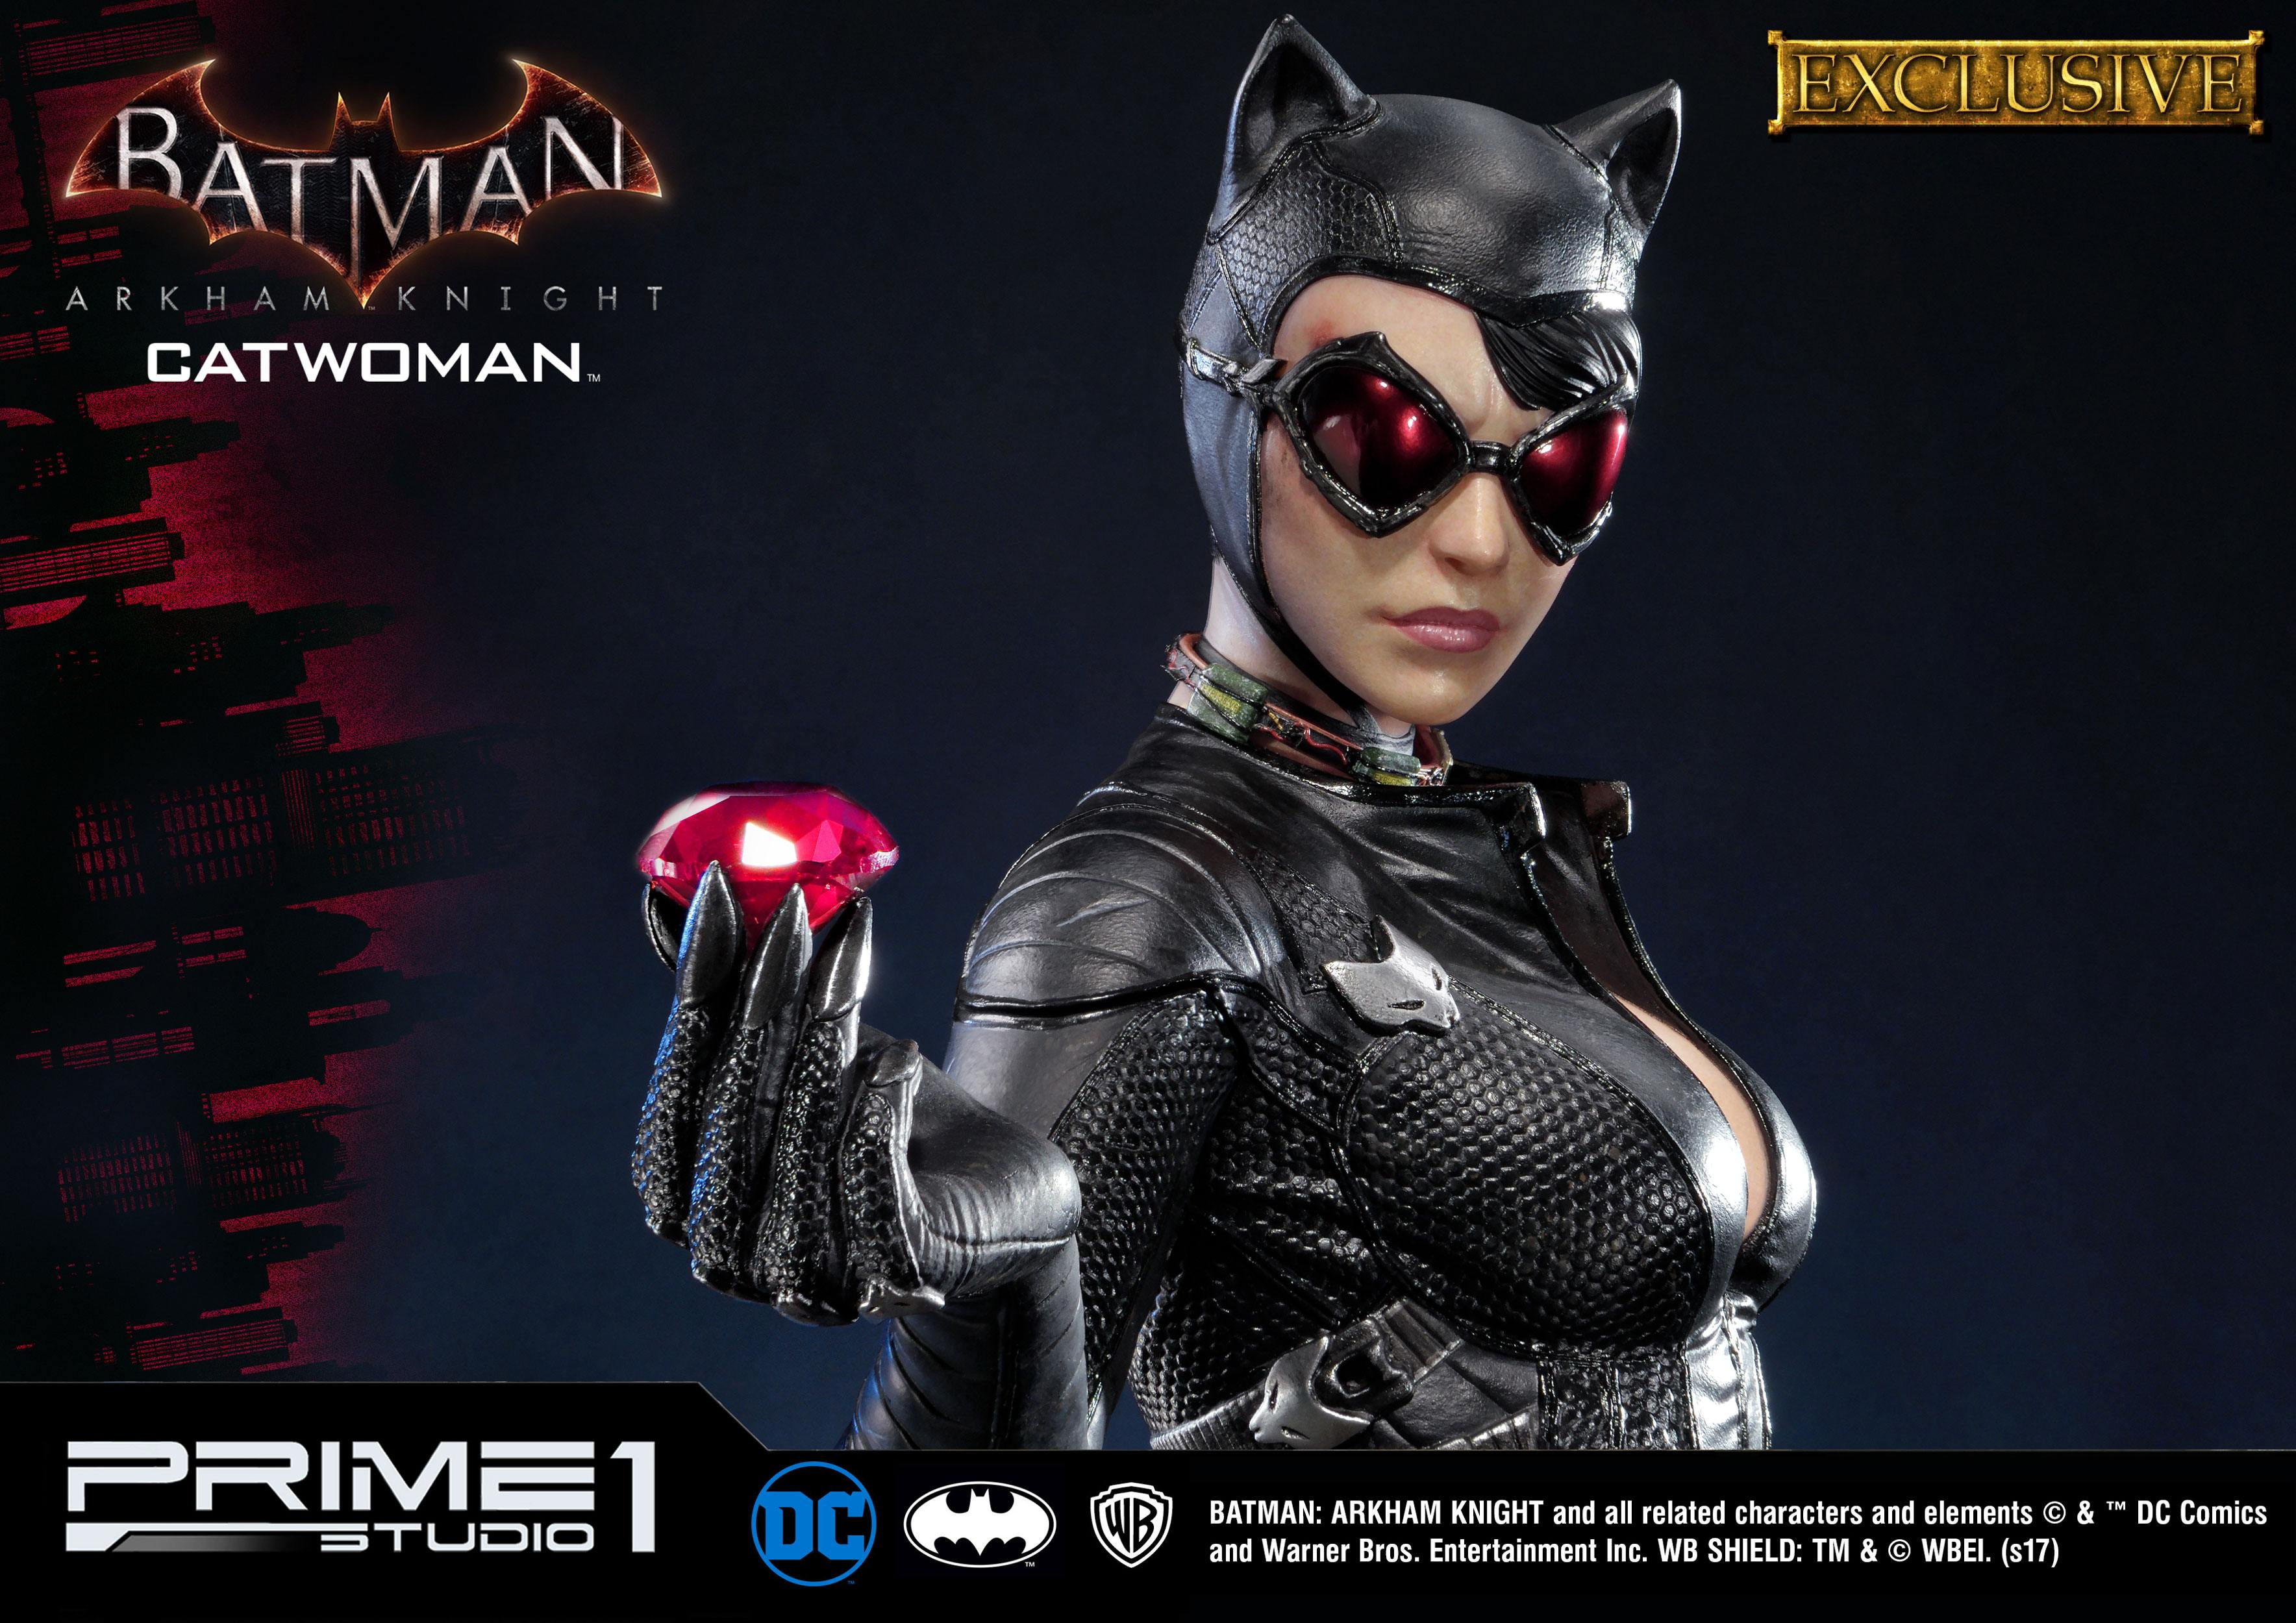 Teen black spiderman costume